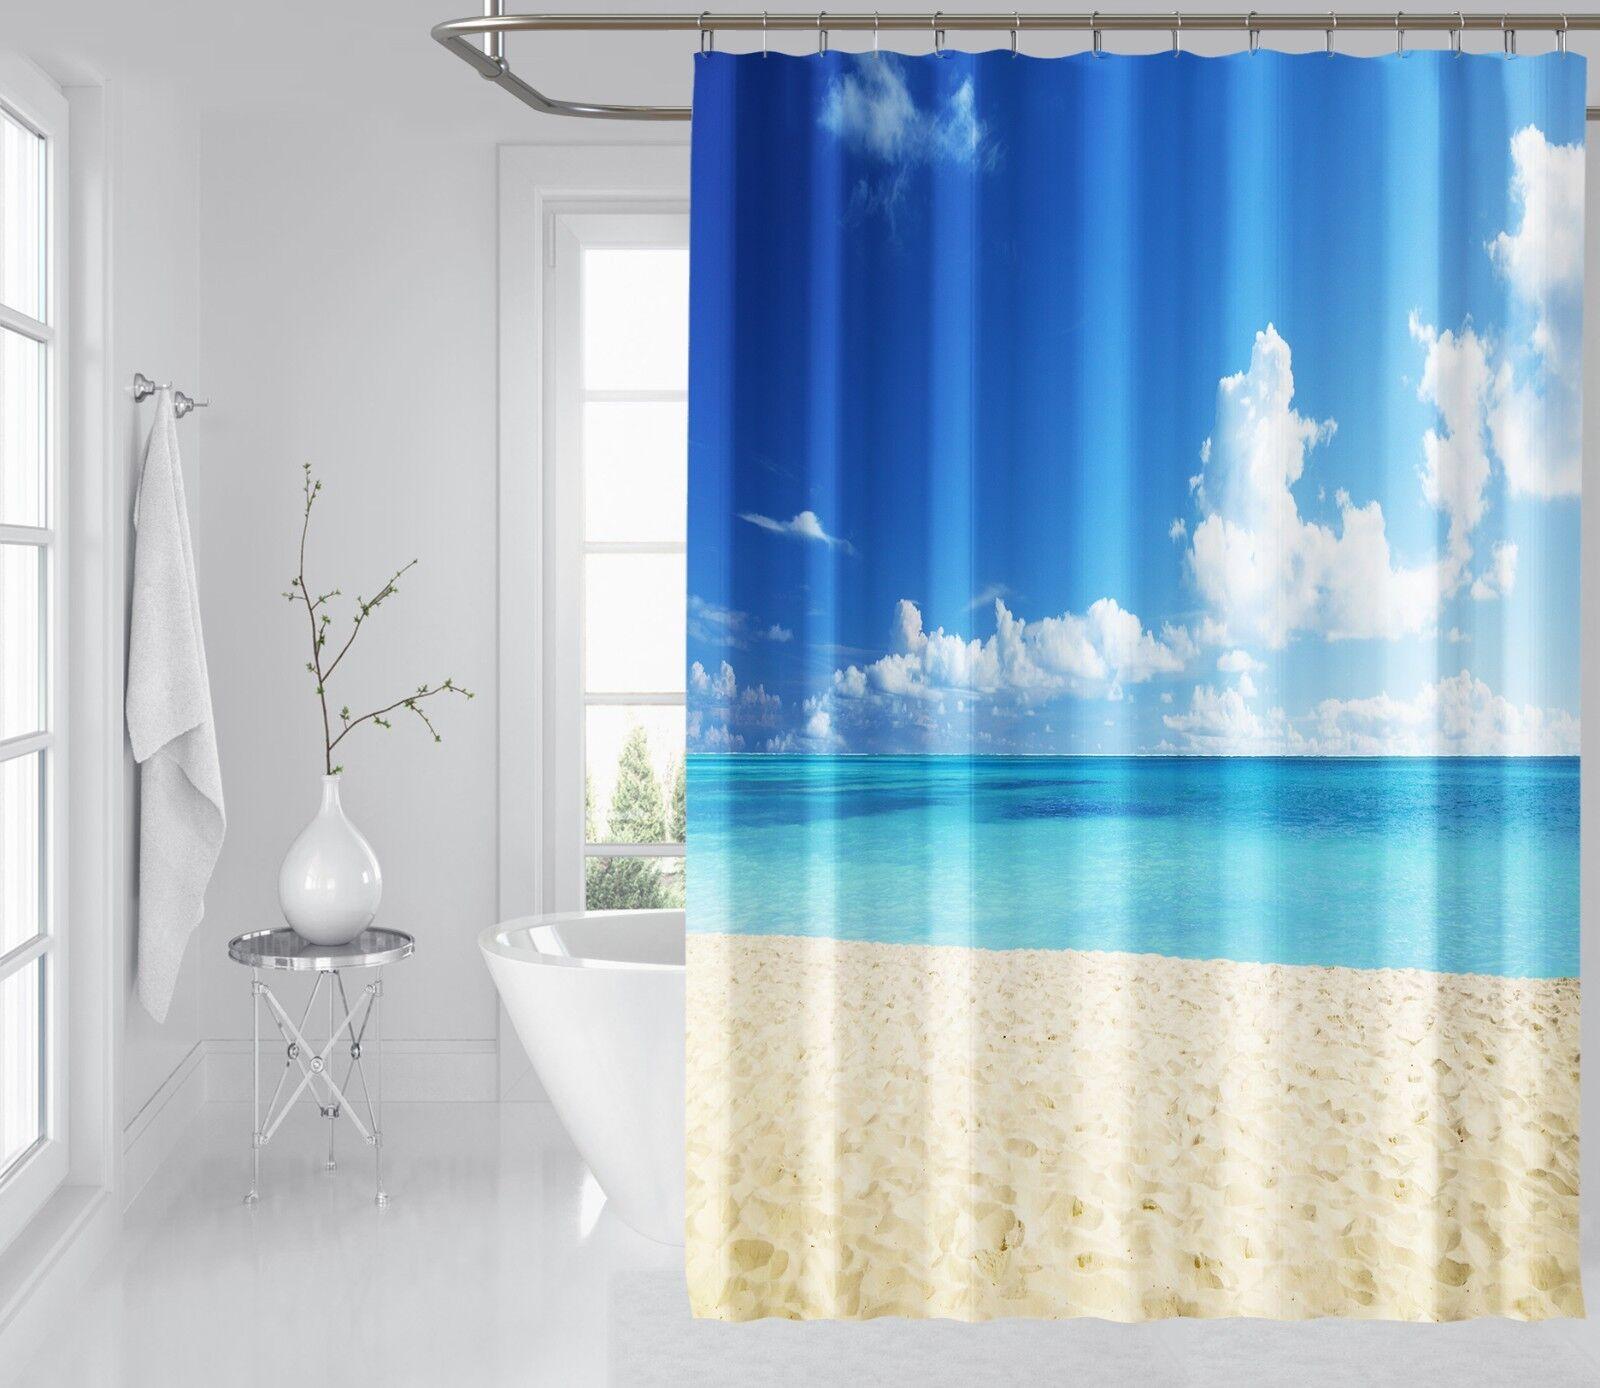 3D bella spiaggia 245 Tenda da doccia IMPERMEABILE Fibra Bagno WC Windows